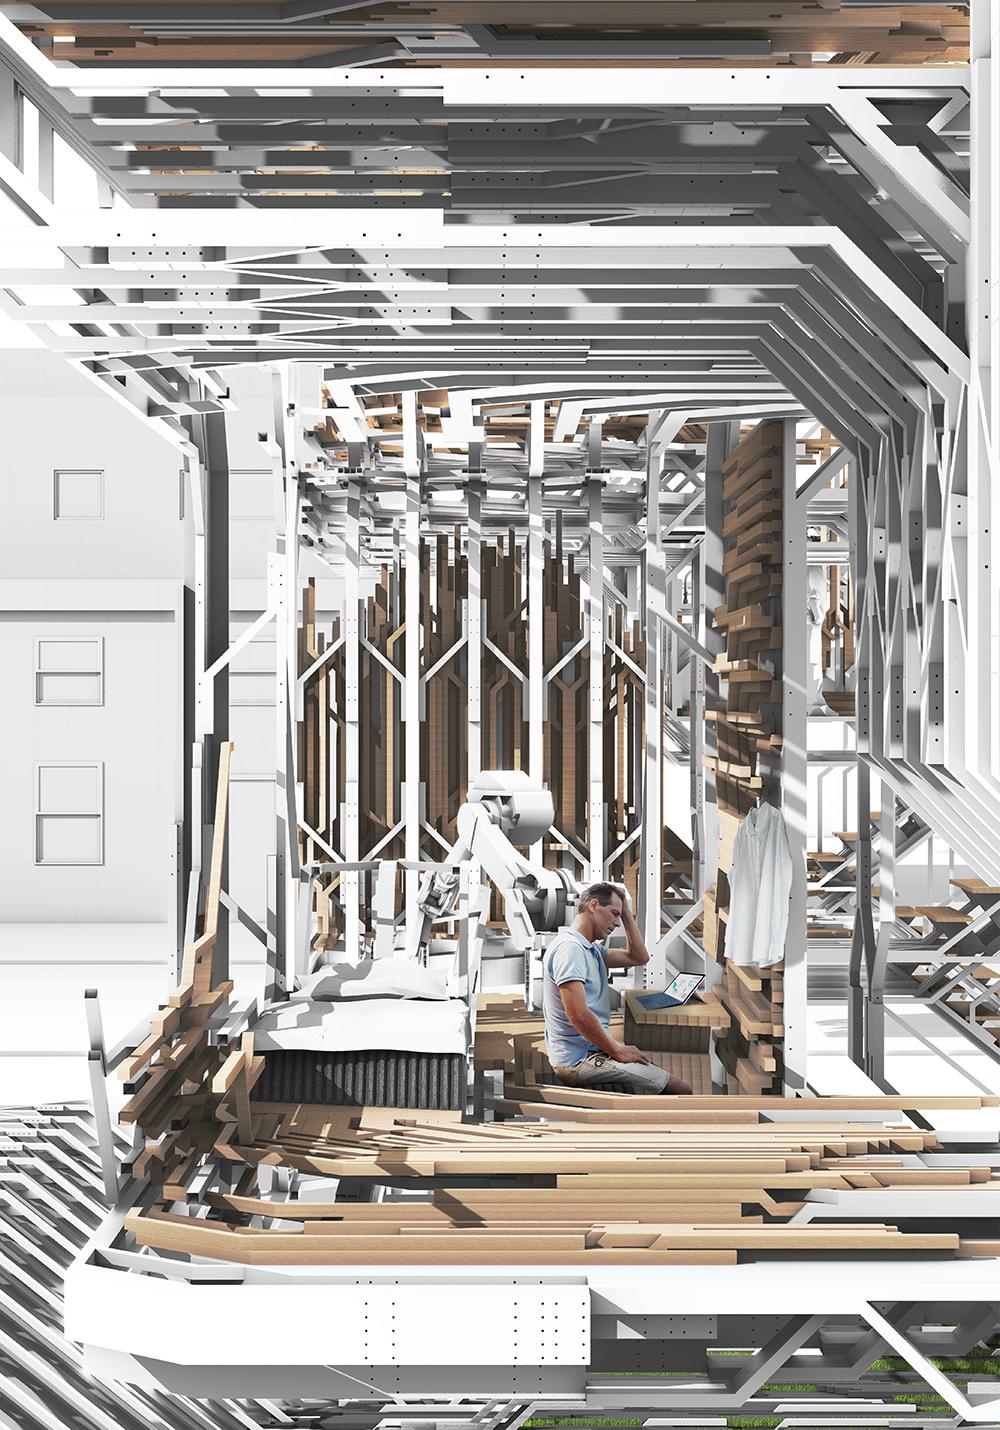 Shogo Suzuki - Digital Metabolism, Year 4